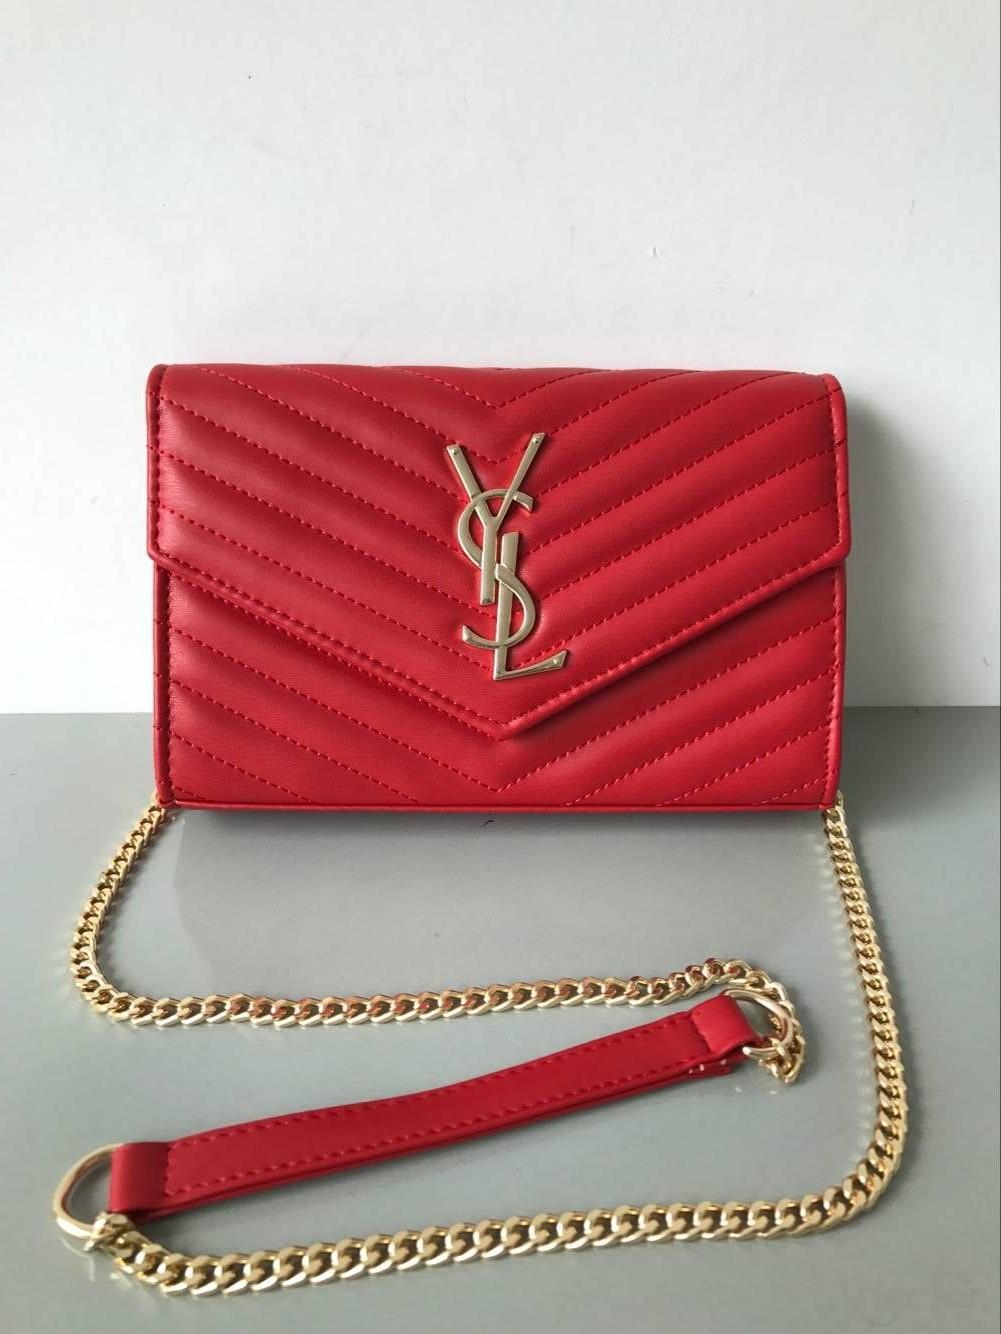 44008db9049 2019 Women handbag handbag ladies designer designer handbag high quality  lady clutch purse retro shoulder bag 88658